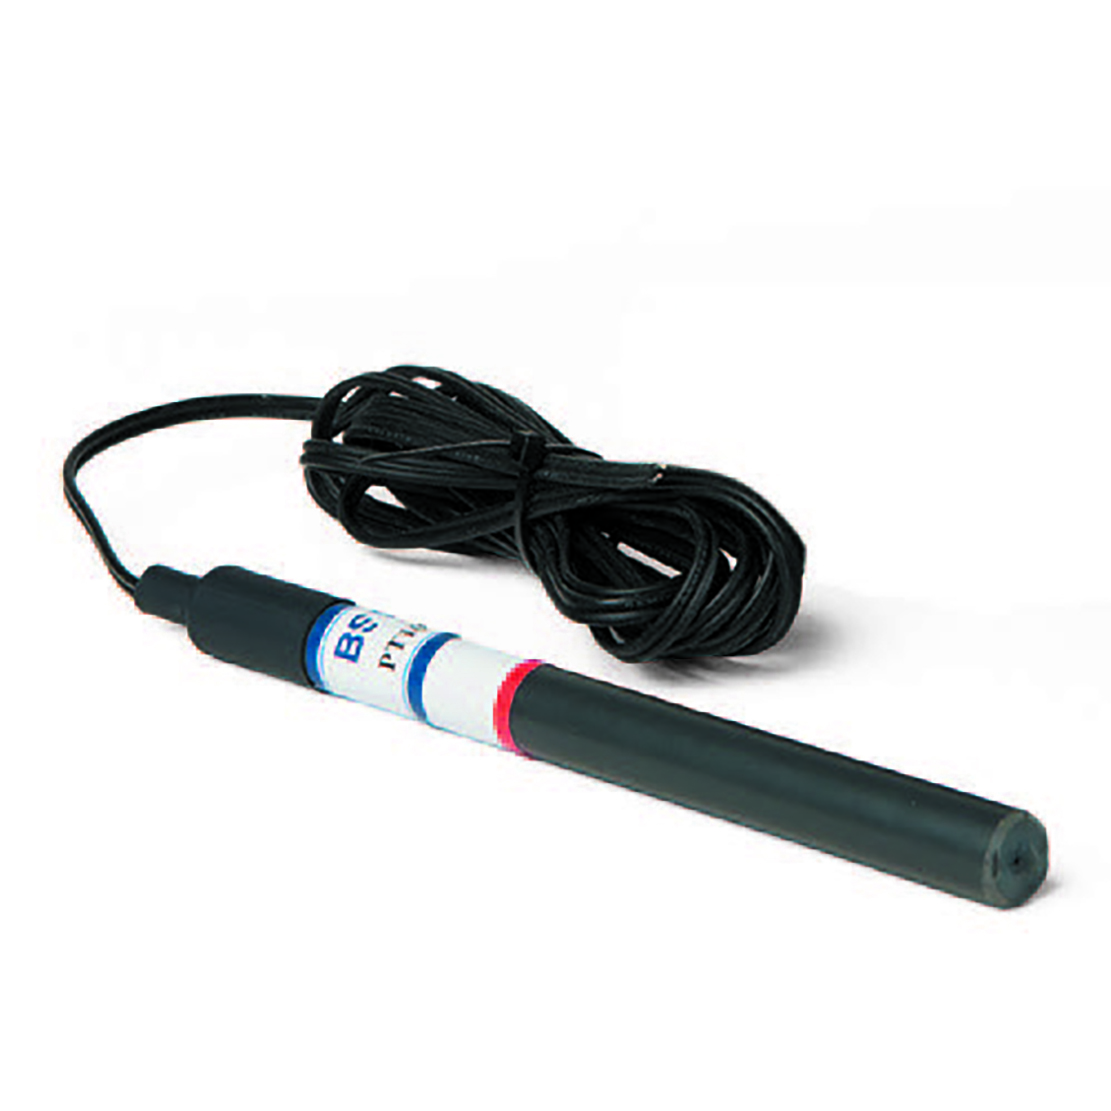 Sensor Temperatur Set, inkl. Sensorhalter, ohne Anbohrschelle Sensor Temperatur Set, inkl. Sensorhalter, ohne Anbohrschelle